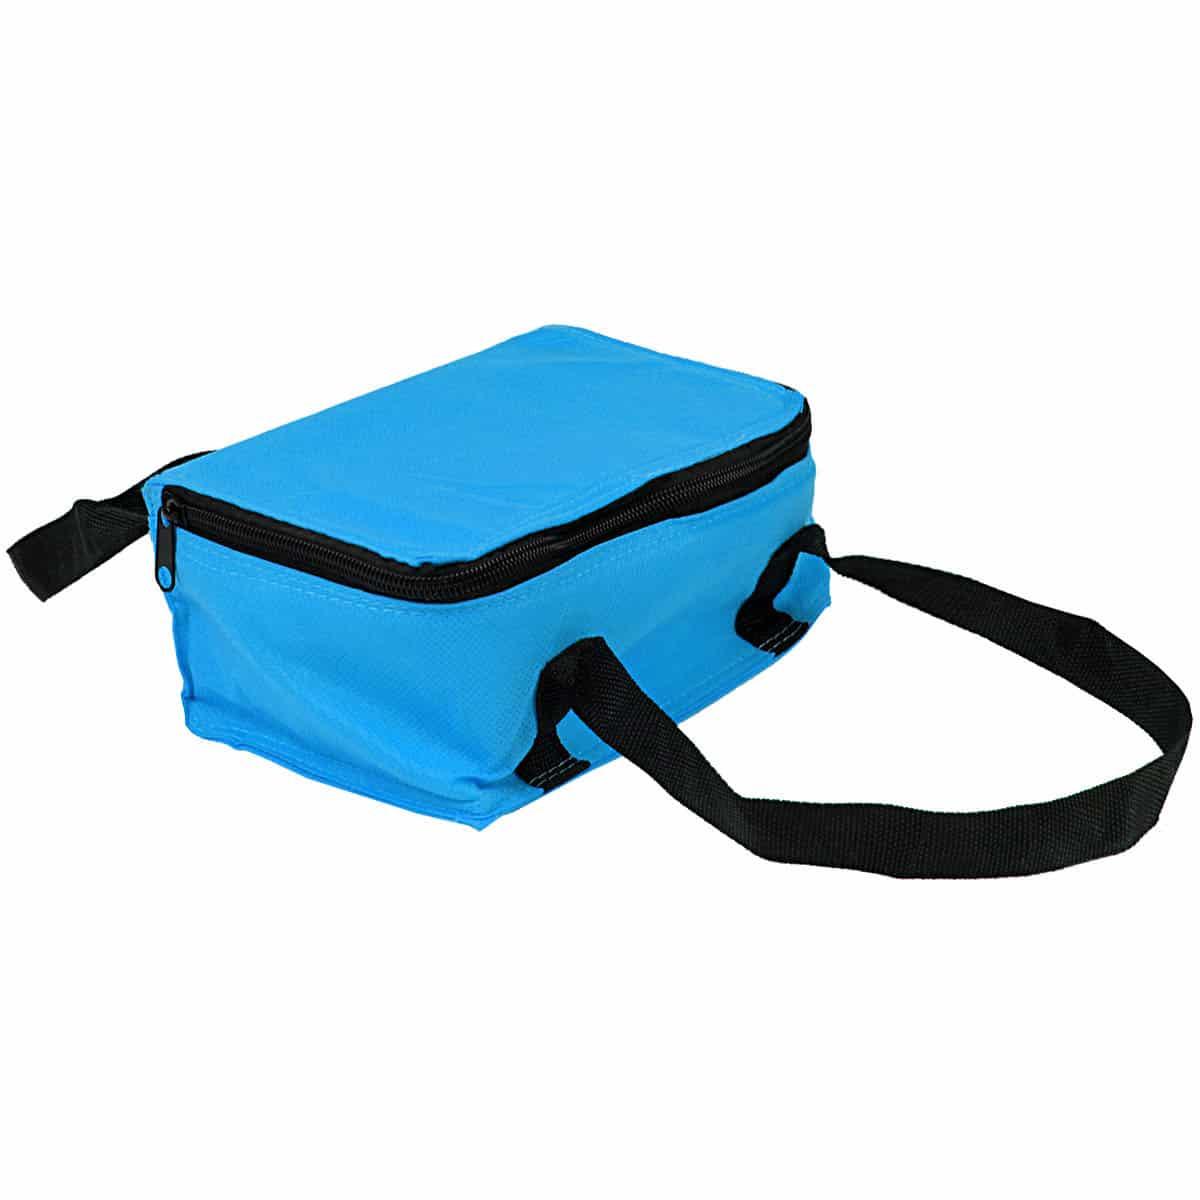 10_70511_1-Isothermiki-tsanta-Lunch-bag-mple-akamatra-a